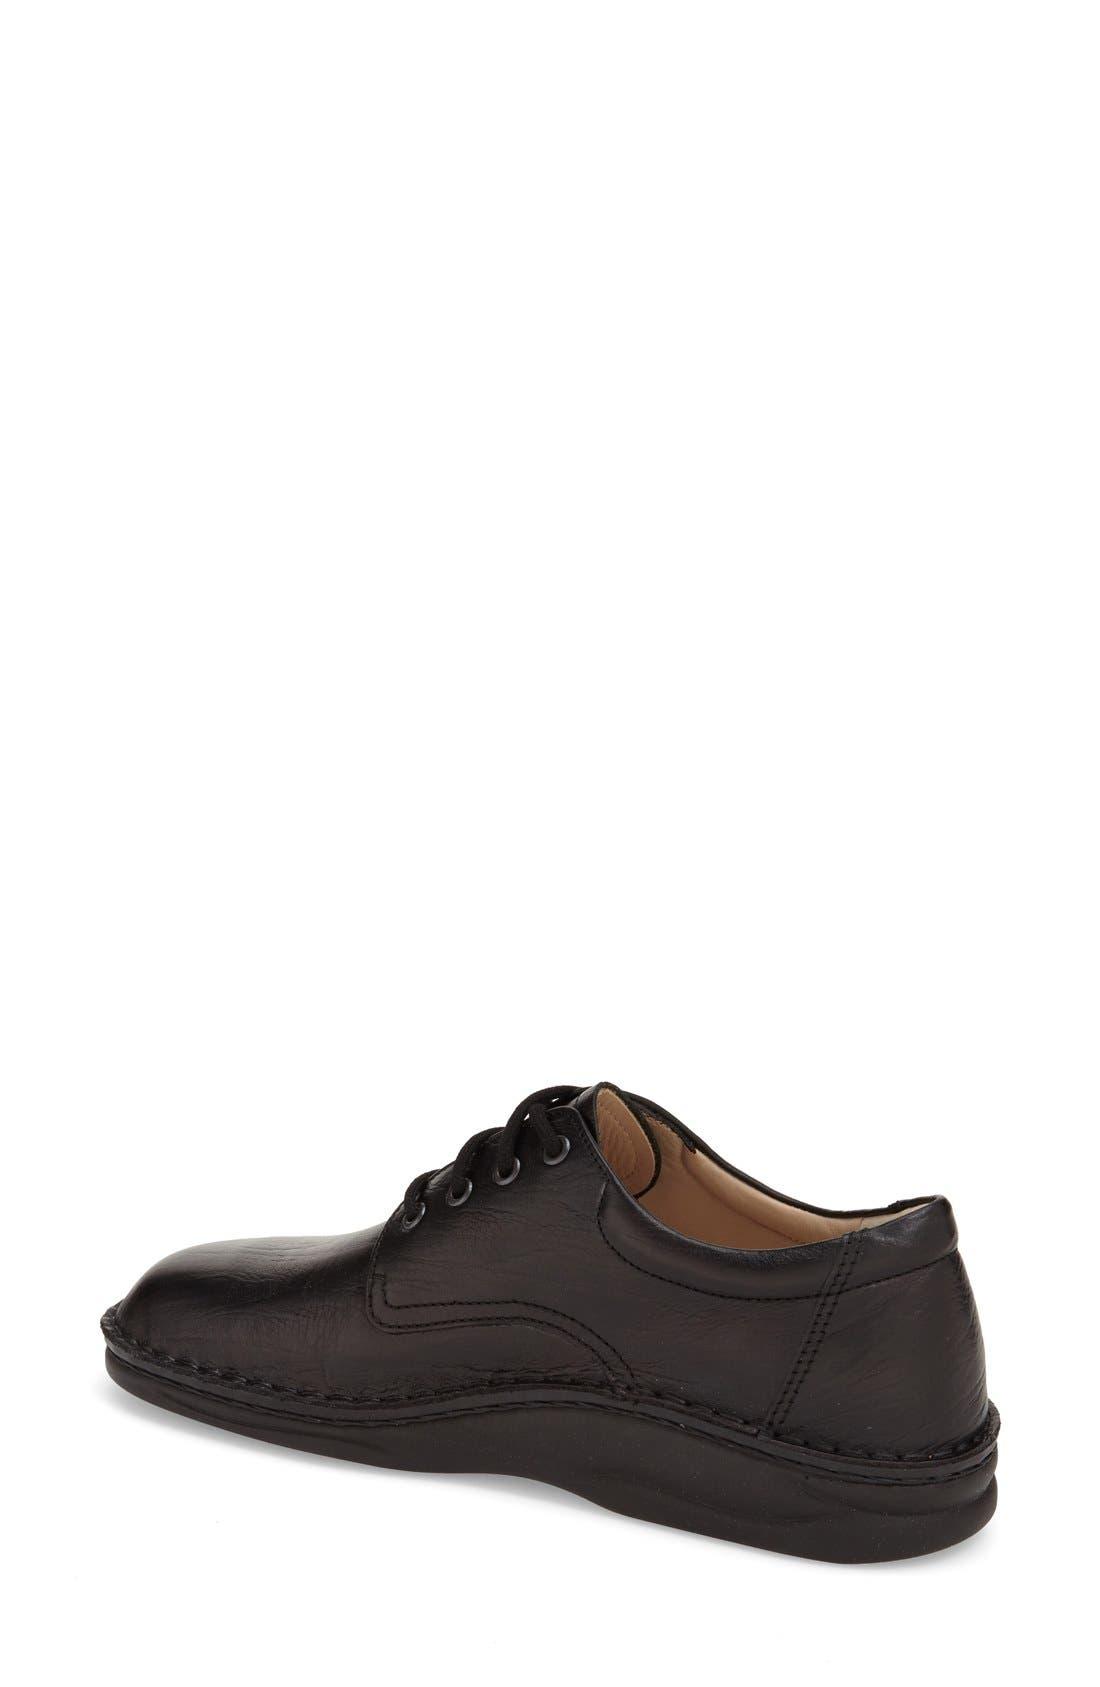 'Metz' Oxford,                             Alternate thumbnail 2, color,                             Black Leather